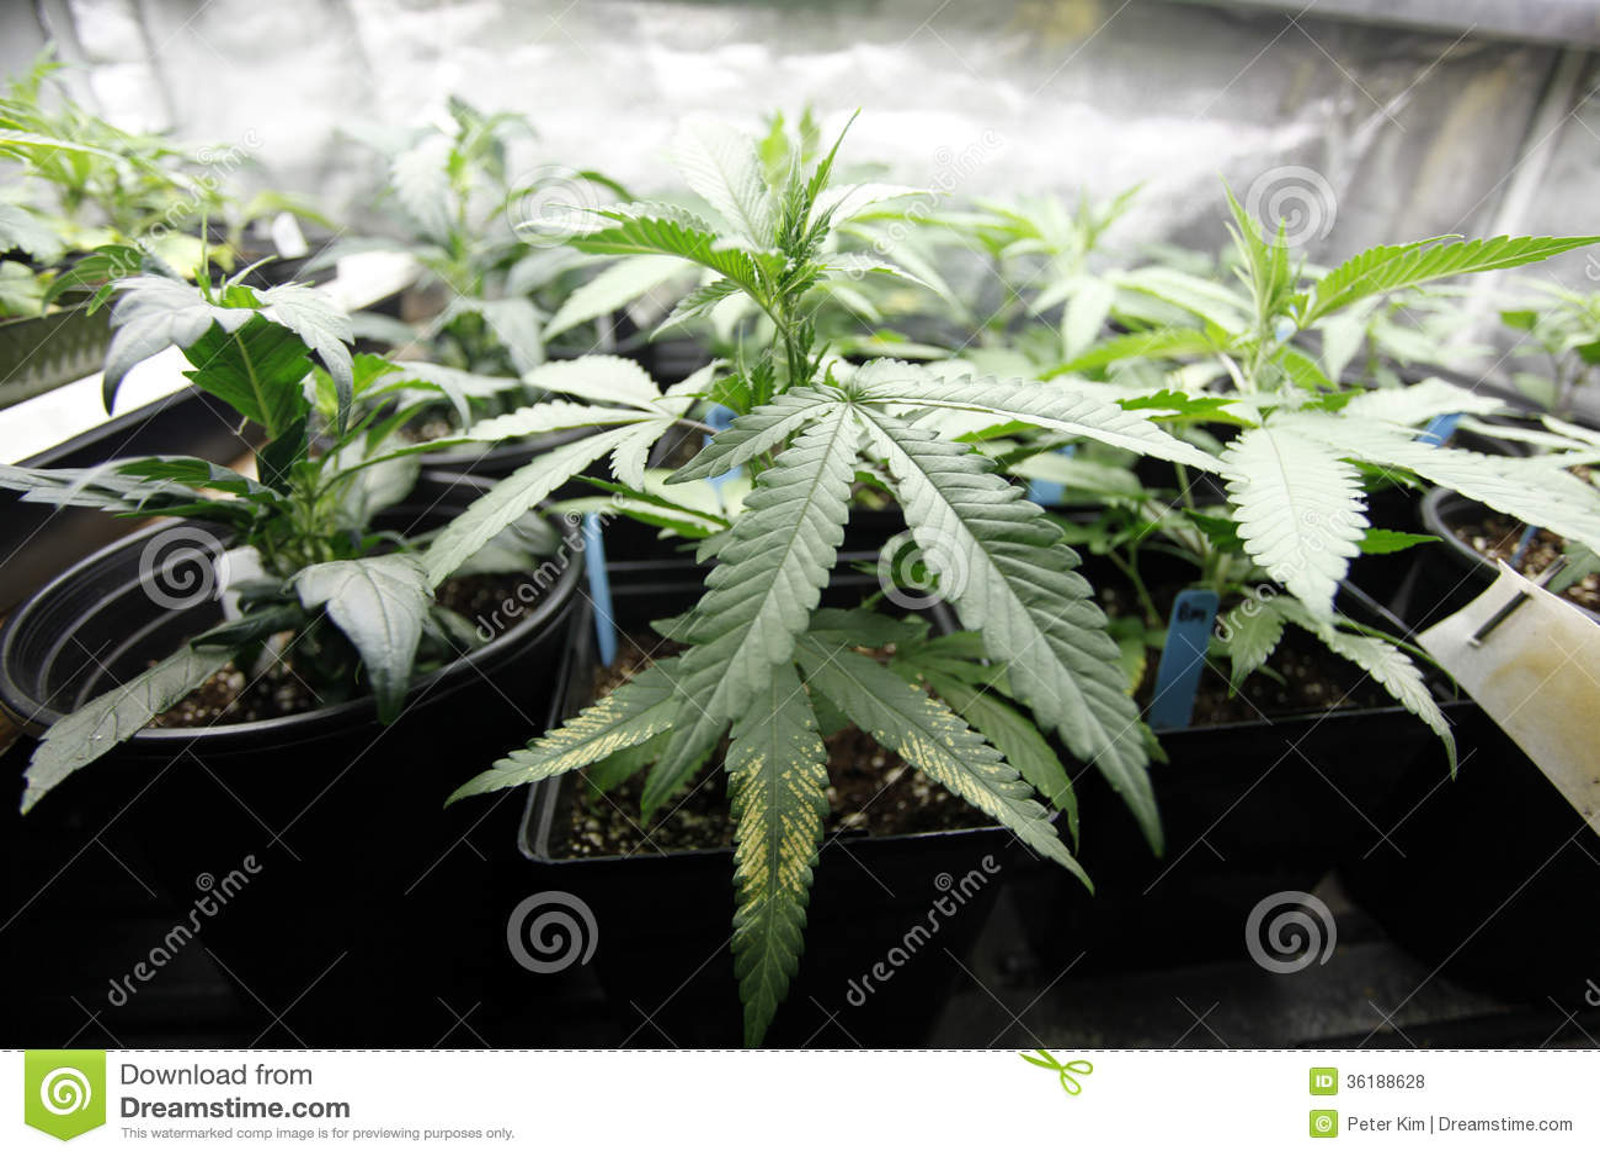 Culture de marijuana photos libres de droits image 36188628 for Culture interieur cannabis